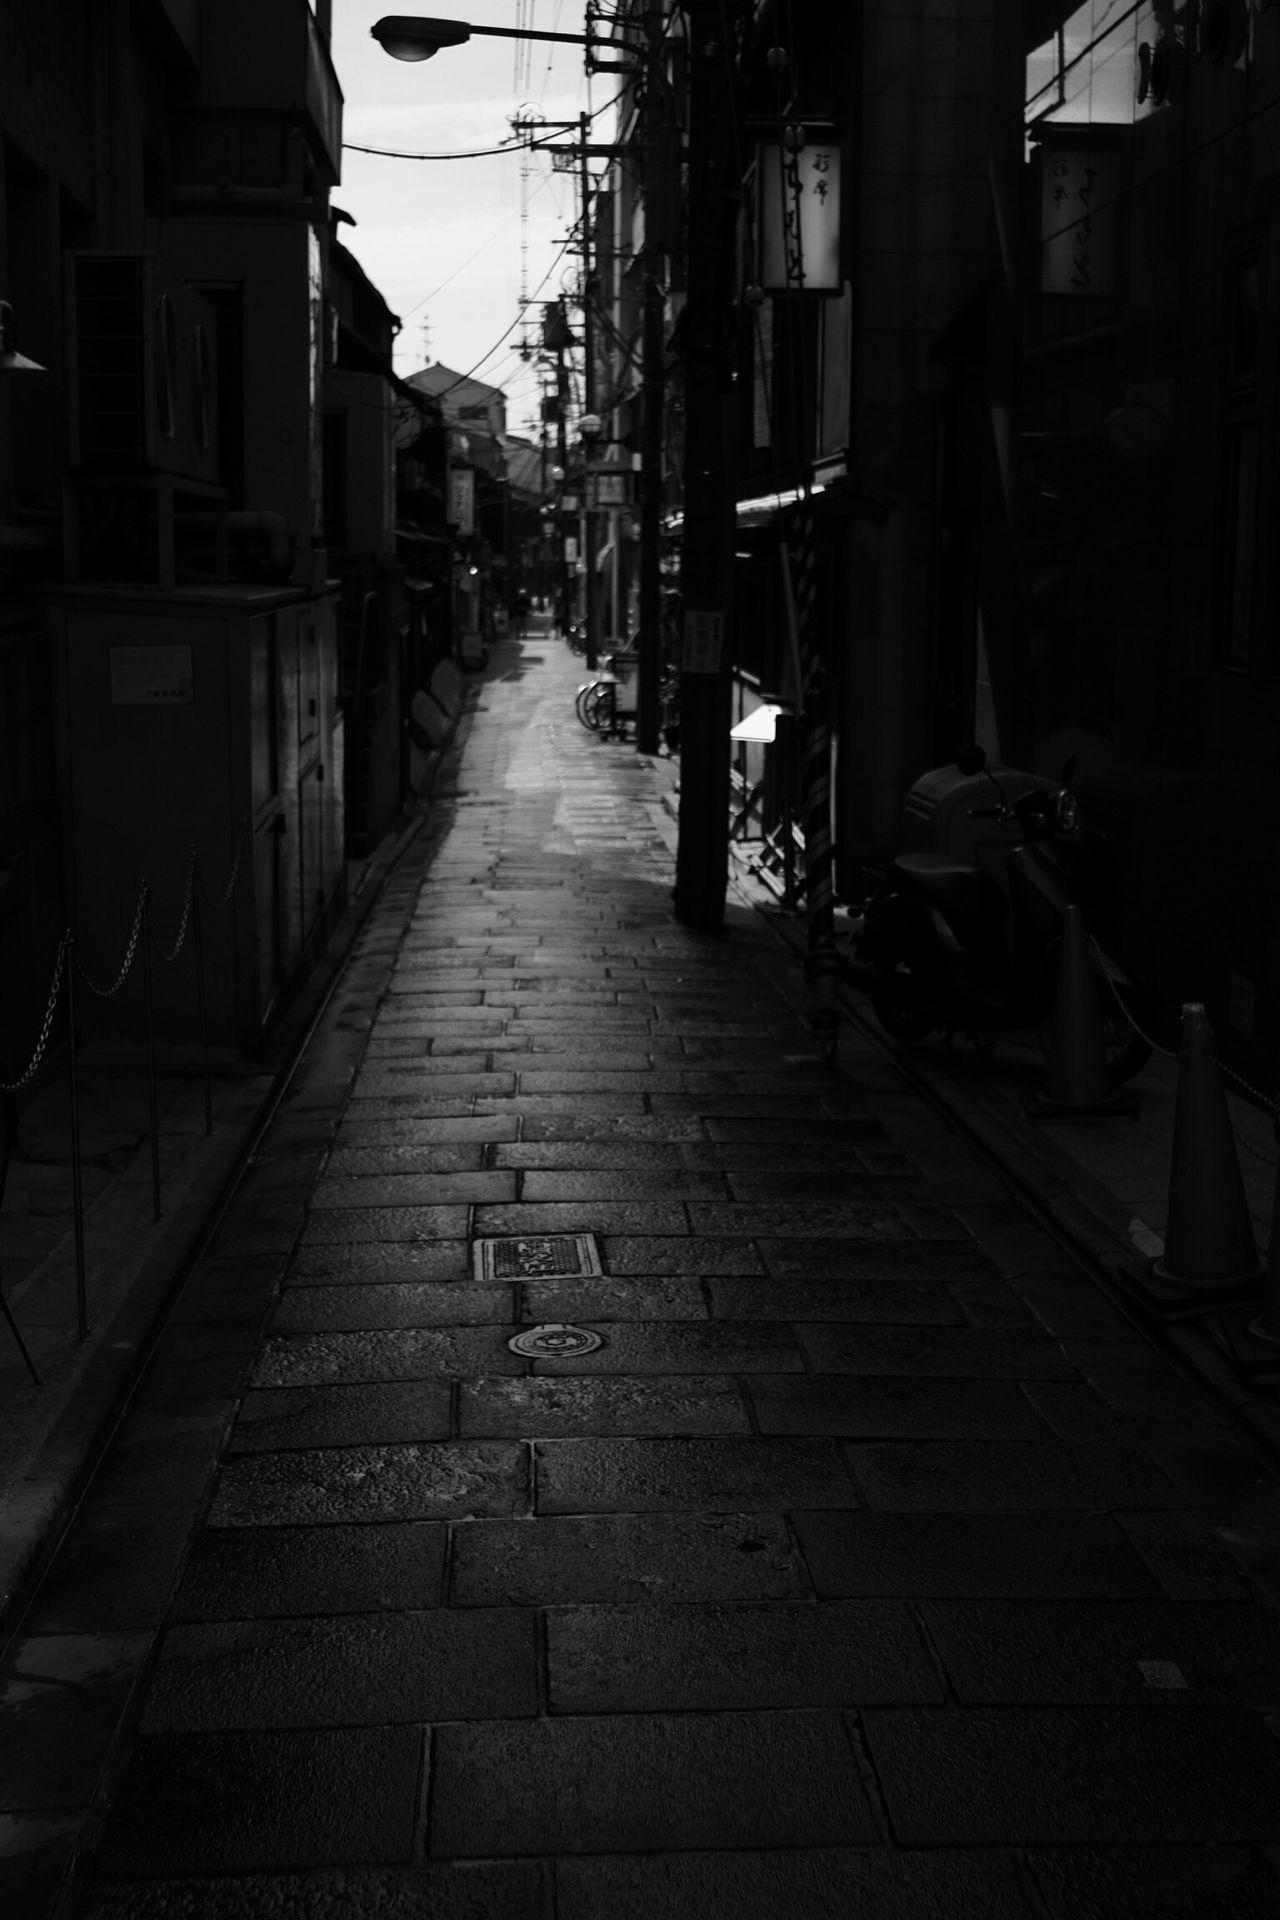 The Way Forward Architecture Street City Takumar Fujifilm Kyoto,japan Fujifilm X-Pro1 BW Collection Xpro1 Takumar 28mm F3.5 EyeEm Gallery Black & White Bw_collection Blackandwhite Black And White Kiyamachi